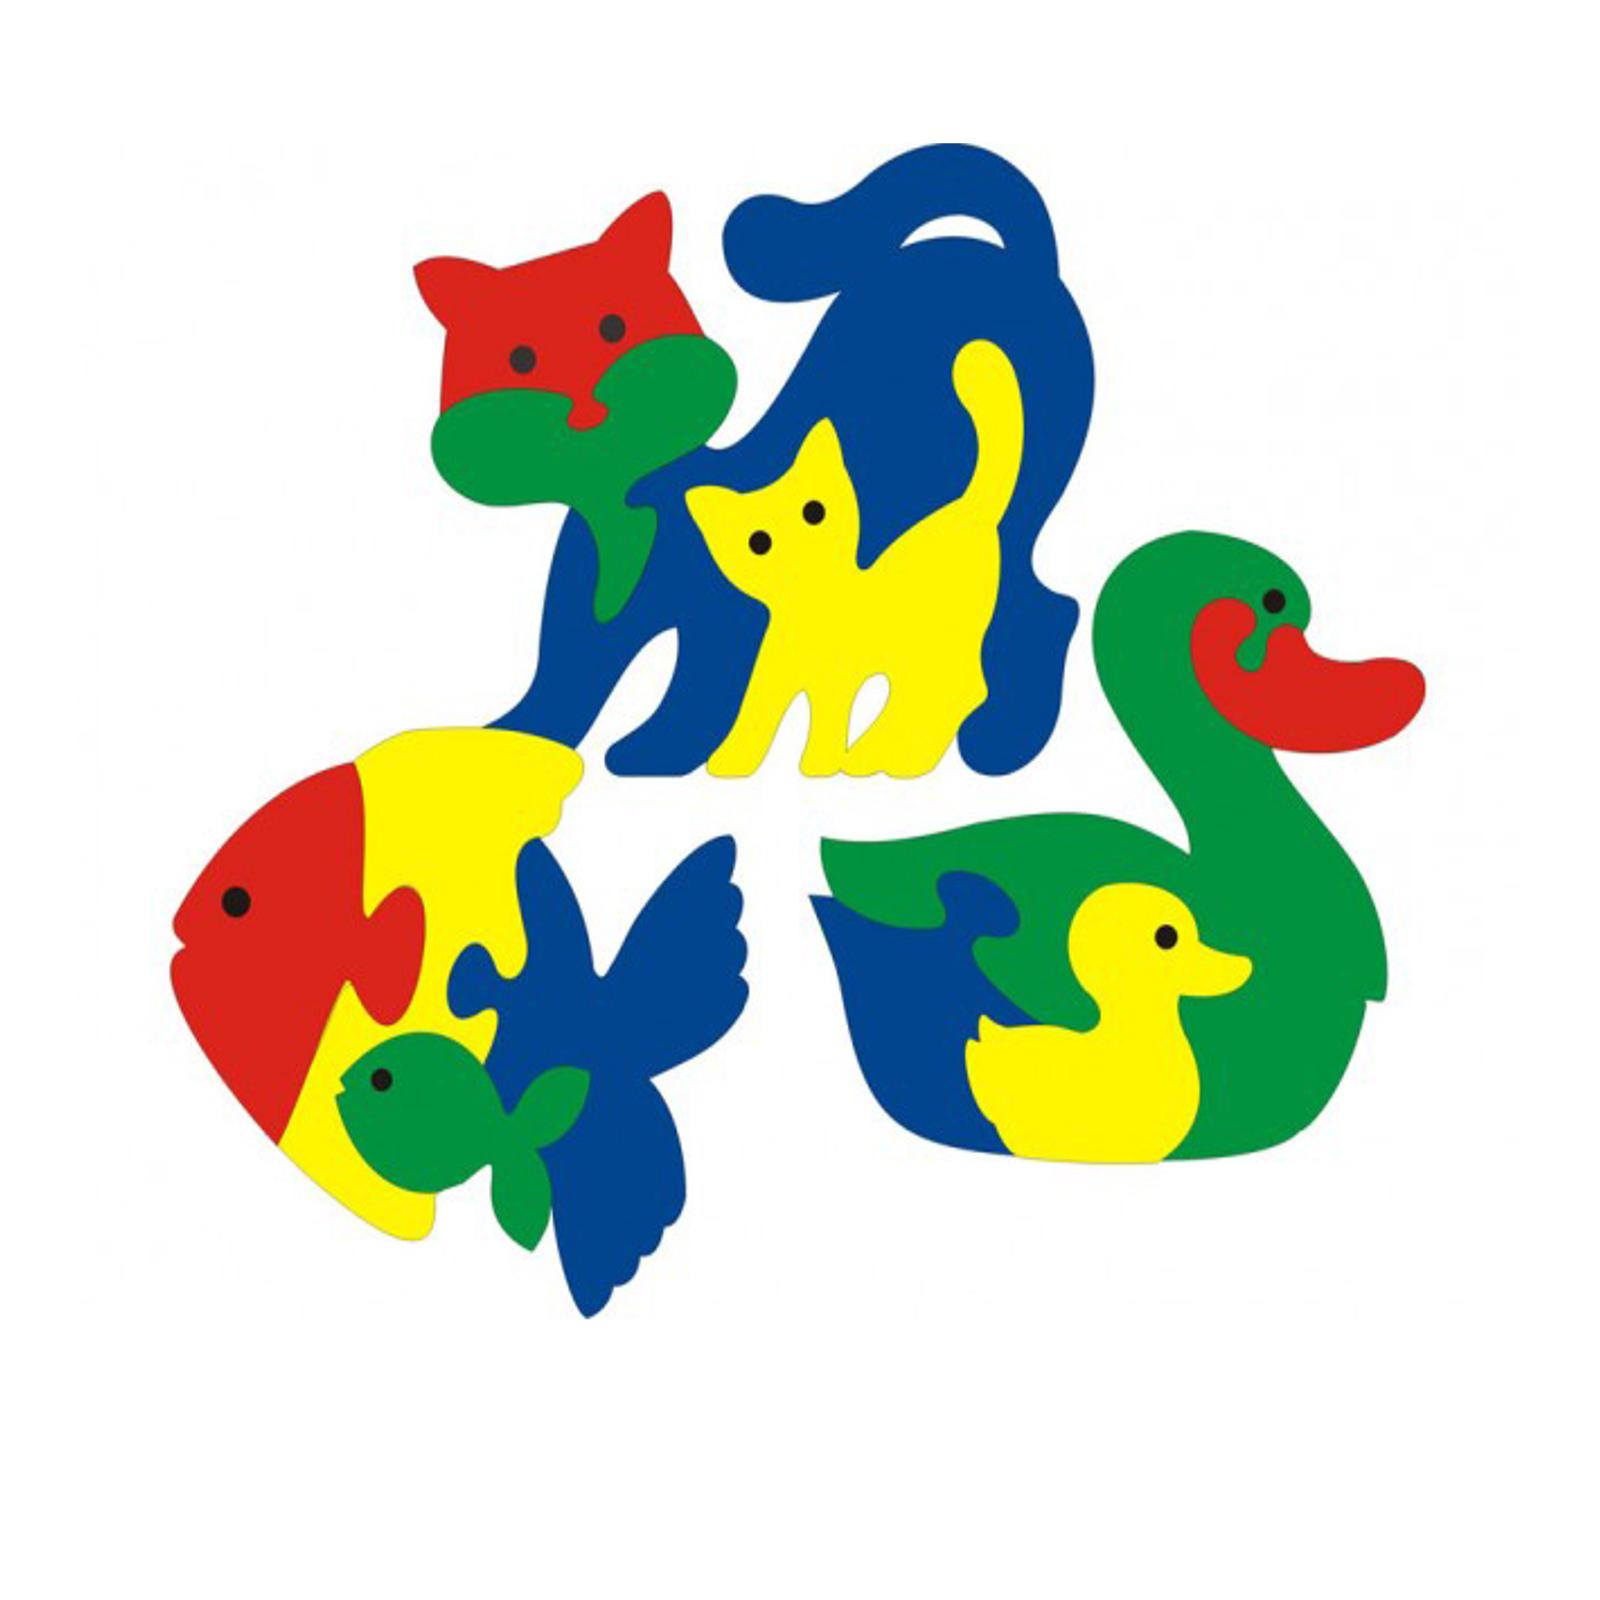 Мозаика Флексика Фигурки животных №2 (3 шт.)<br>